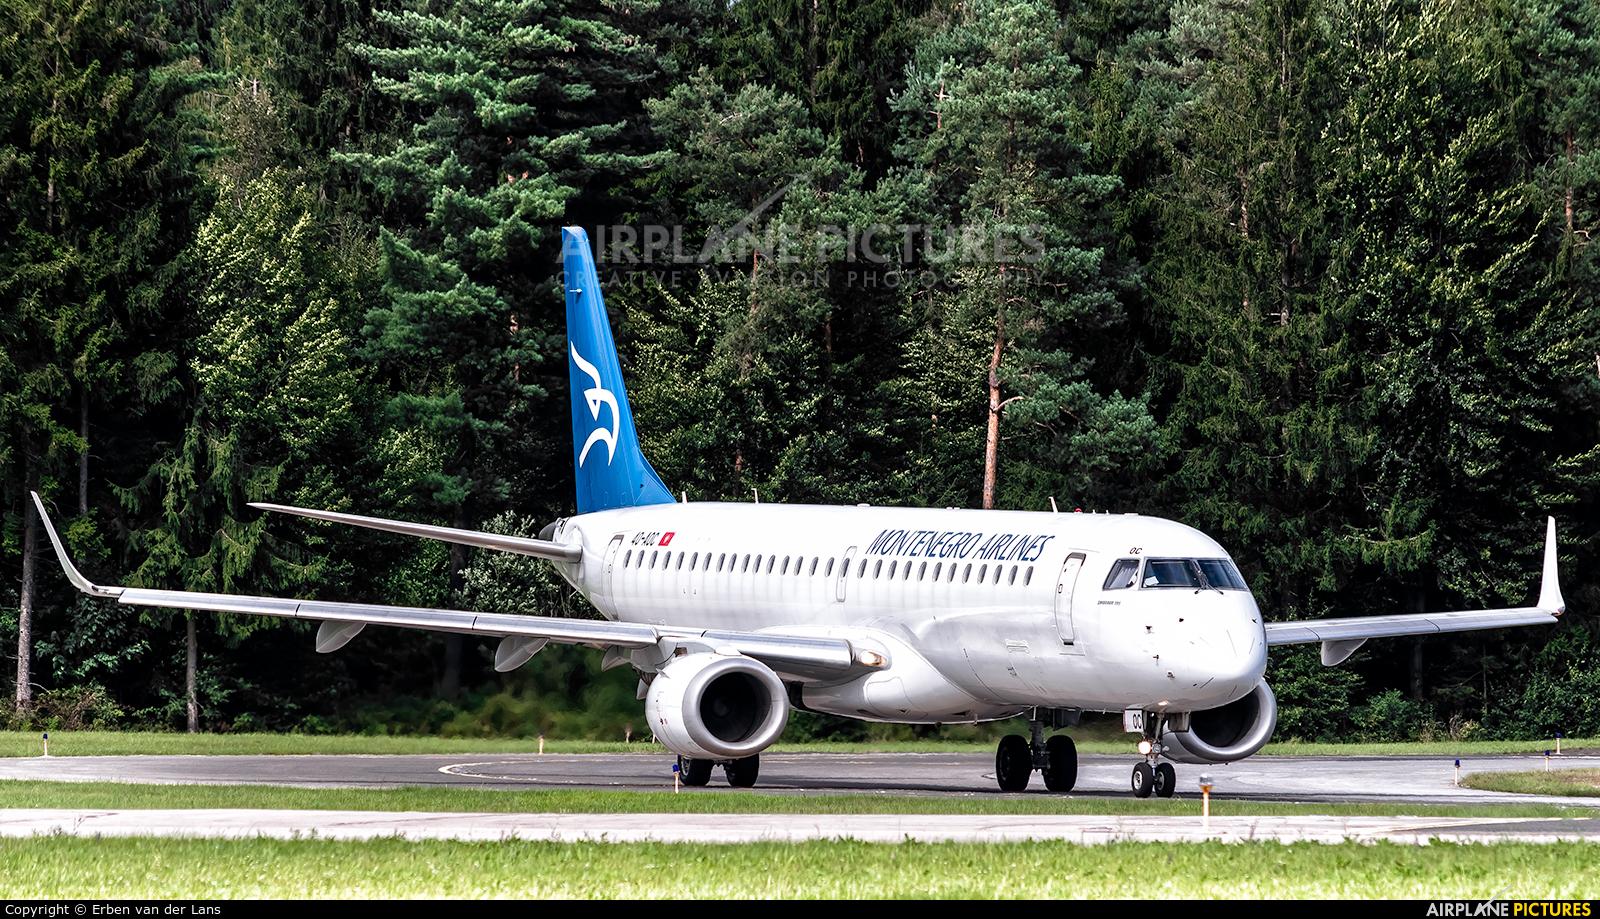 Montenegro Airlines 4O-AOC aircraft at Ljubljana - Brnik